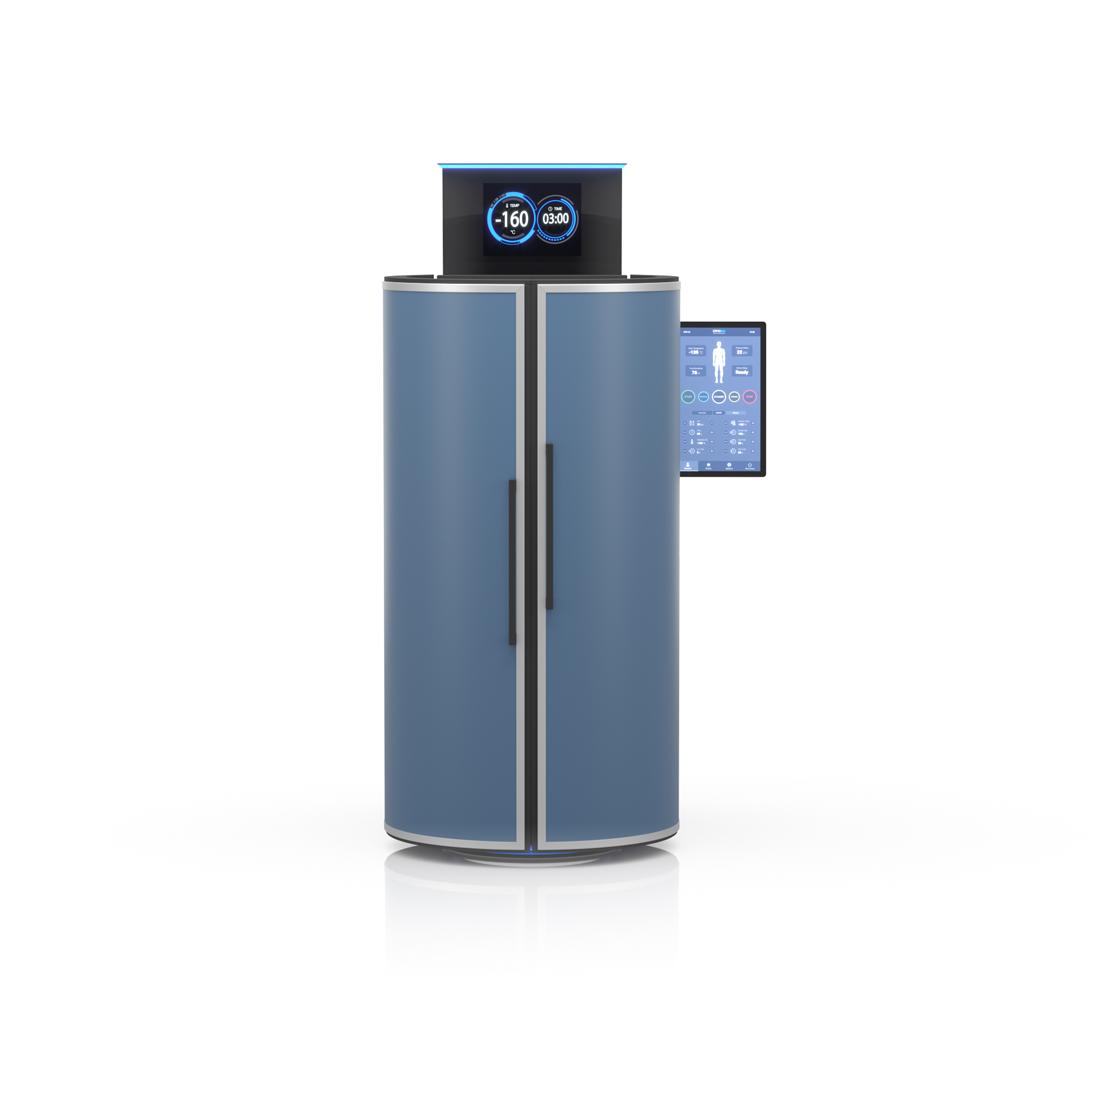 CRYO XC™ Cryo machine in blue